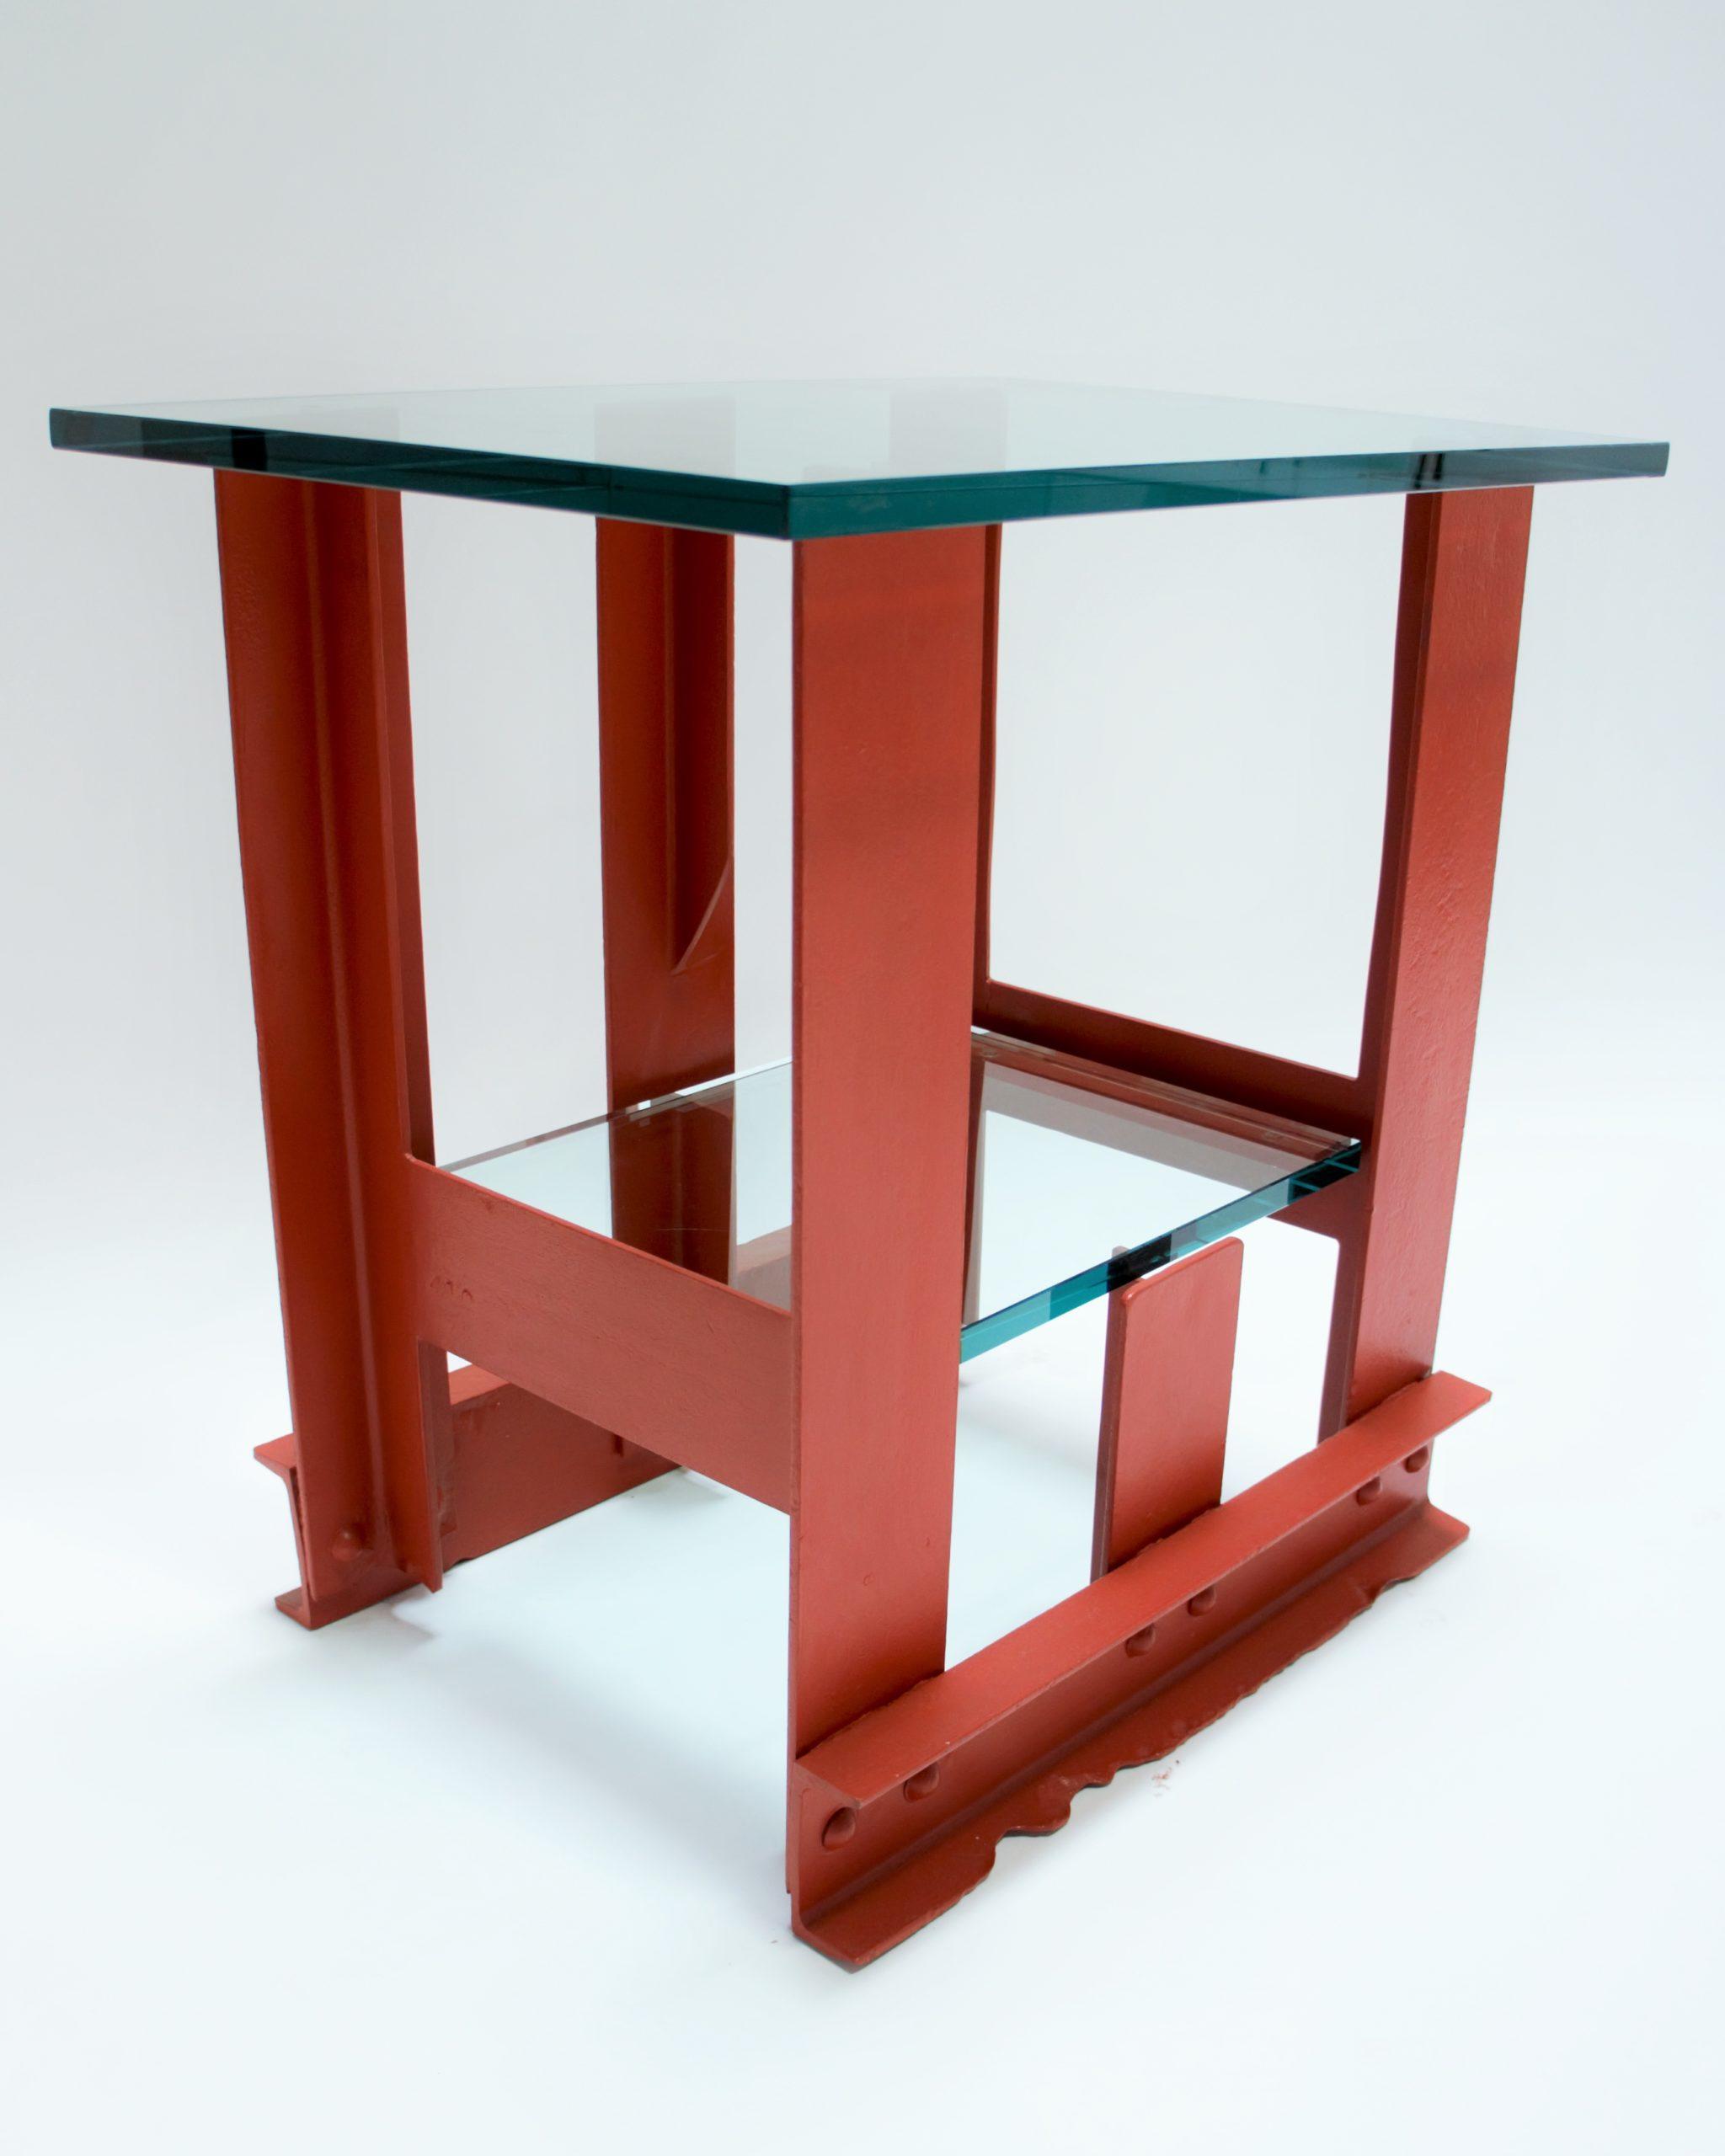 Golden Gate Bridge Steel - Night Table